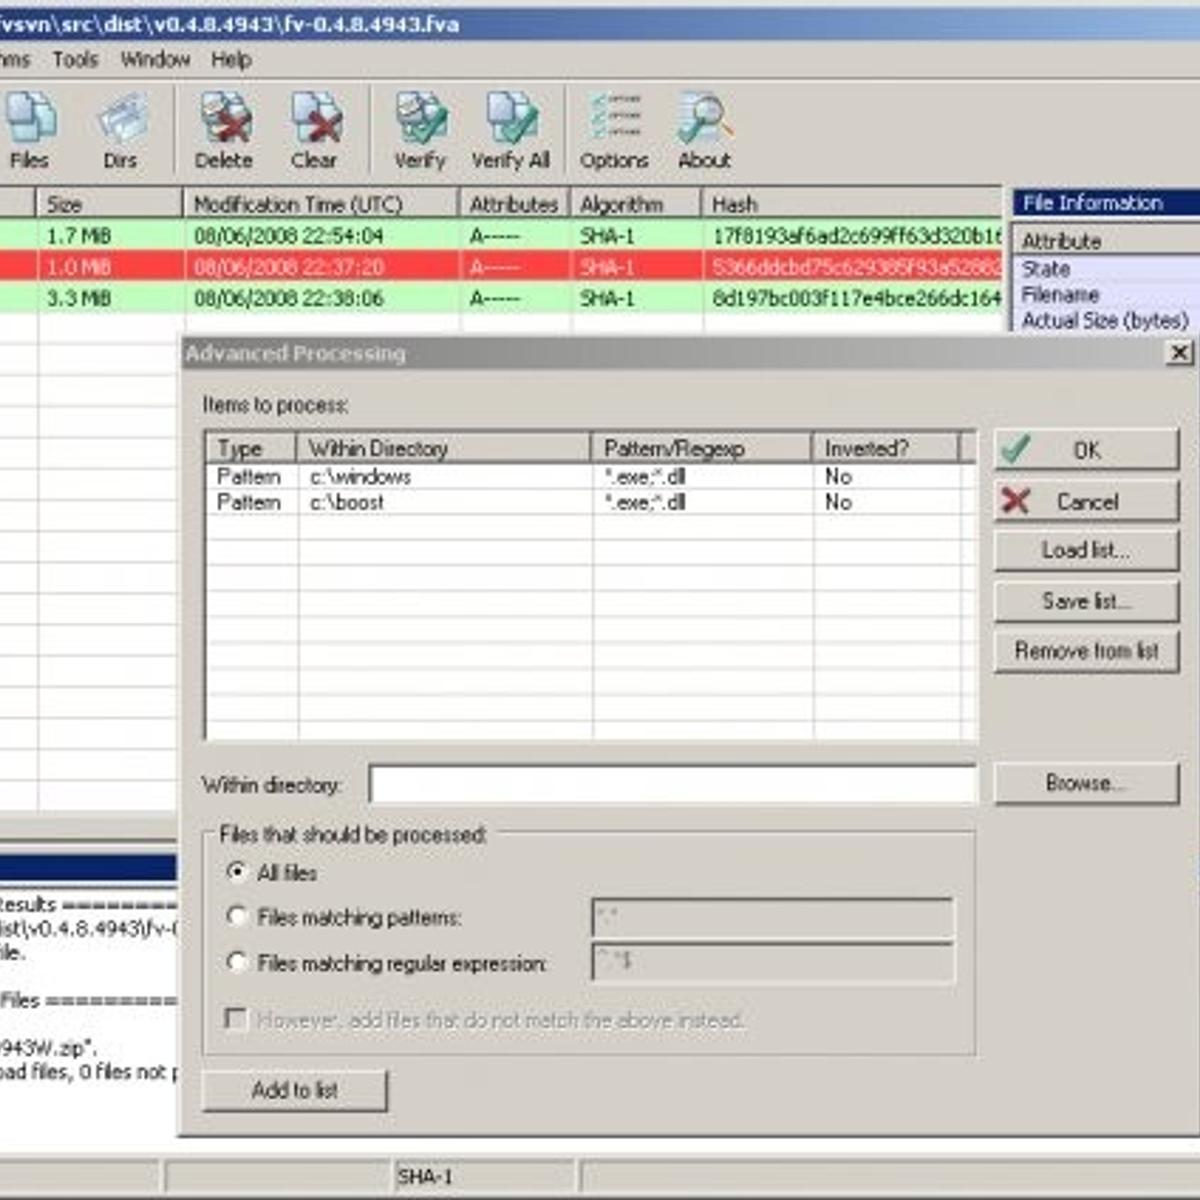 FileVerifier++ Alternatives and Similar Software